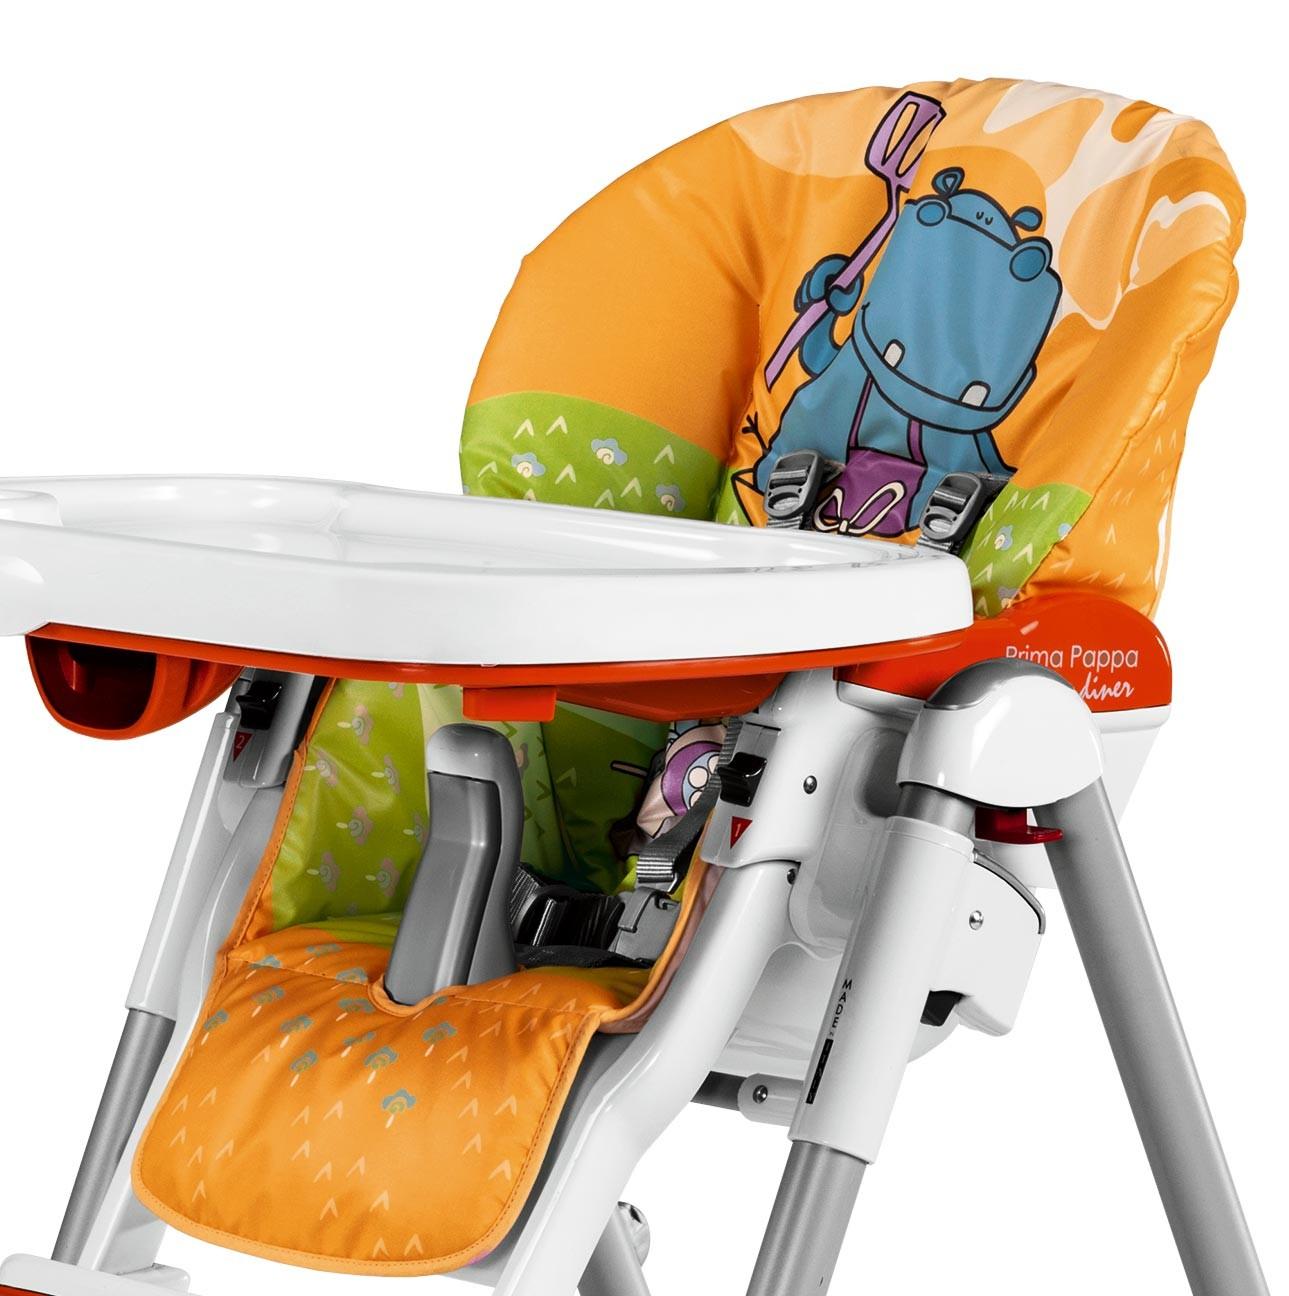 Housse pour Chaise Haute Prima Pappa Diner Orange